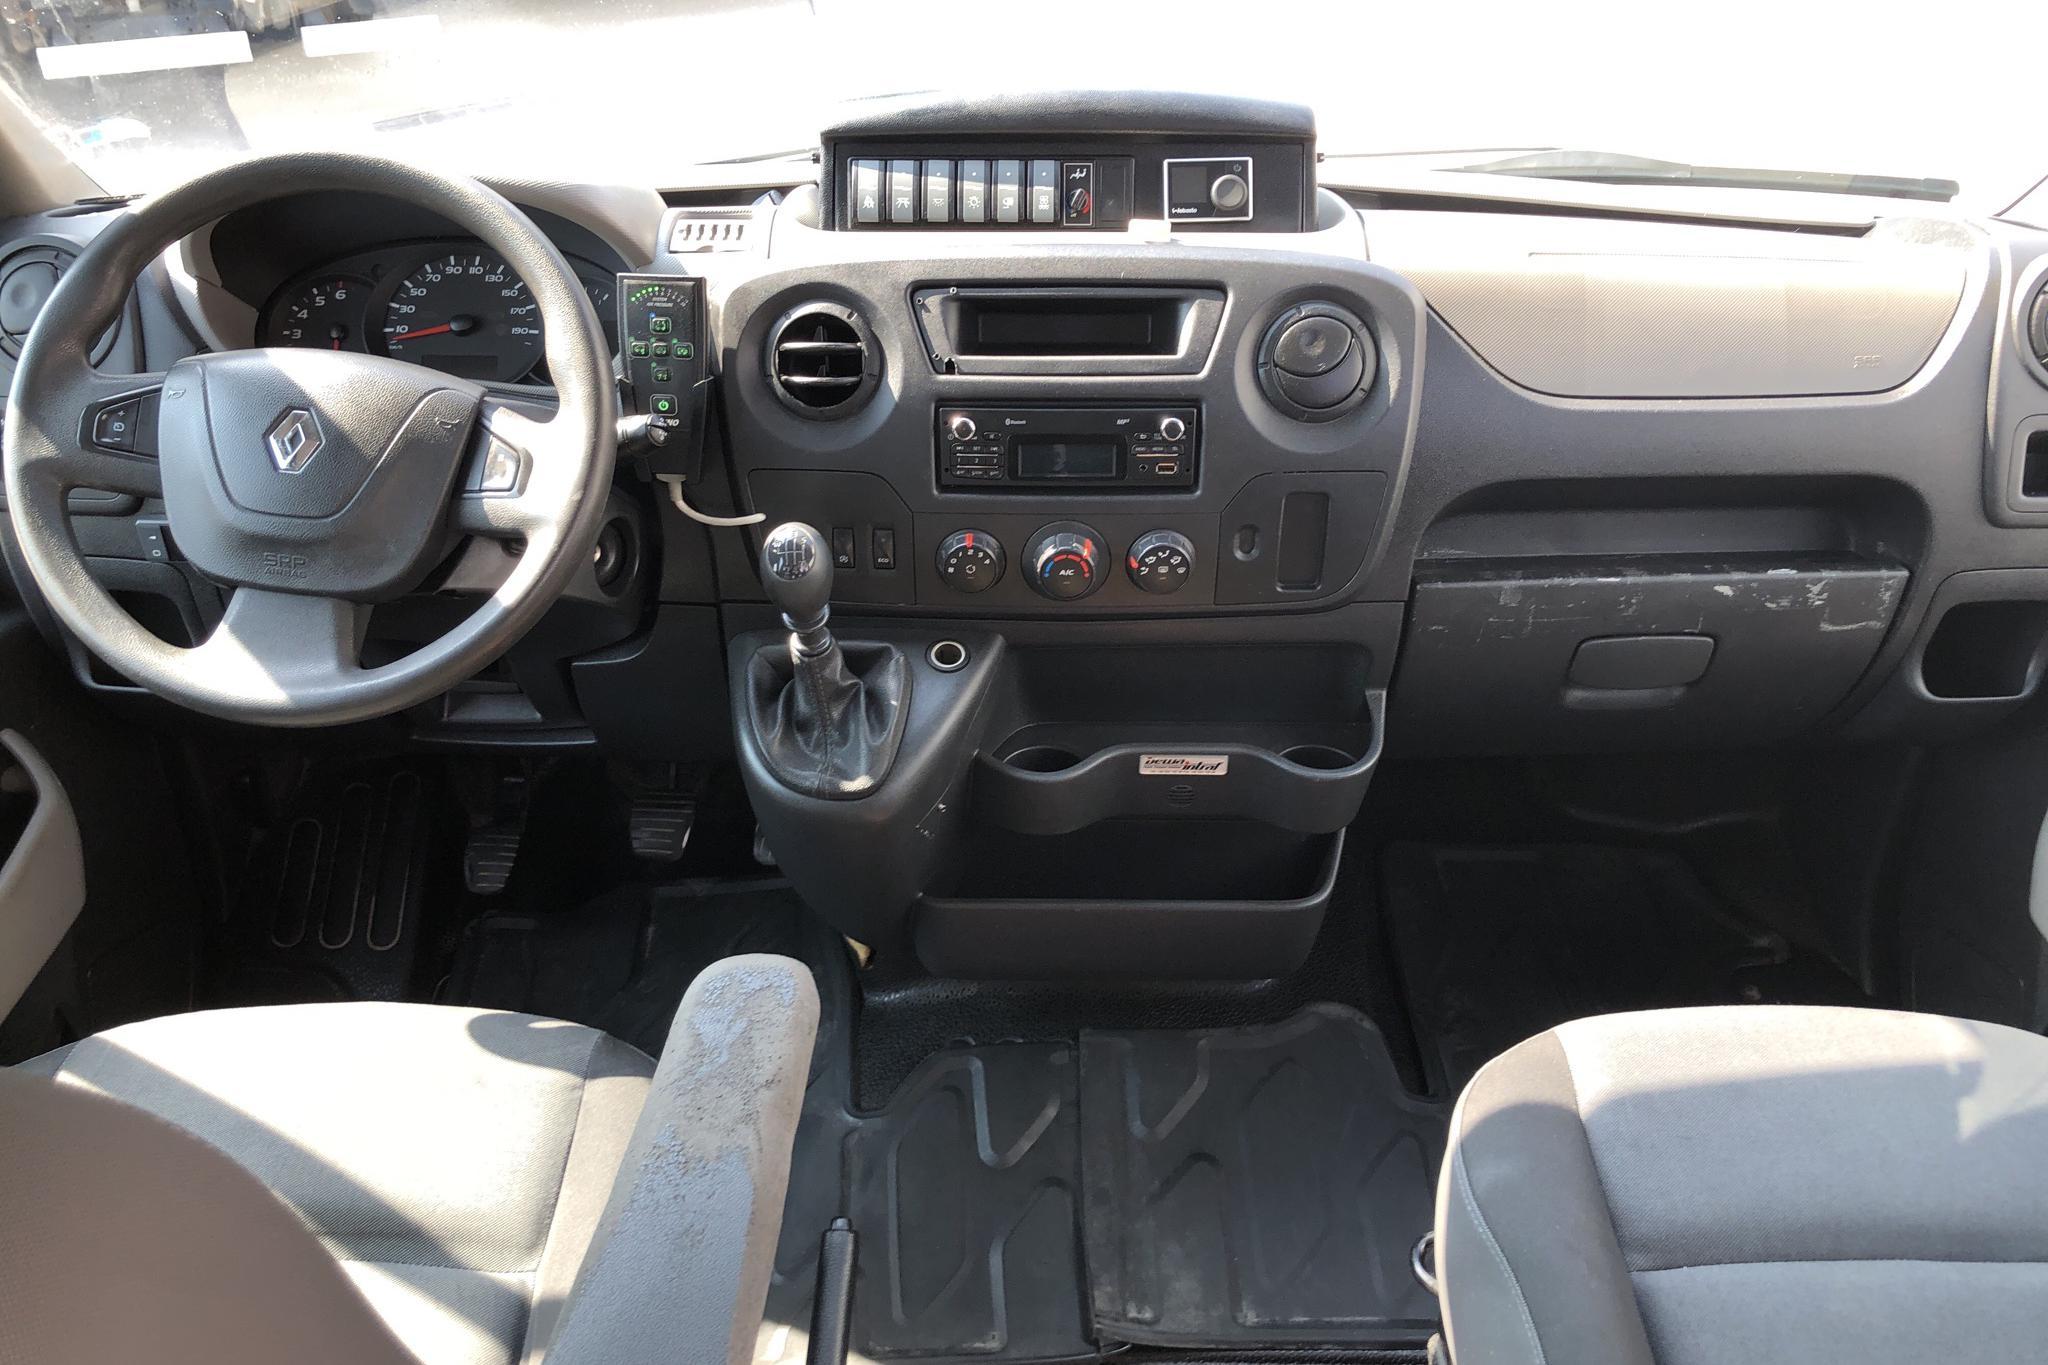 Renault Master 2.3 dCi Pickup/Chassi 2WD (145hk) - 377 360 km - Manual - white - 2016